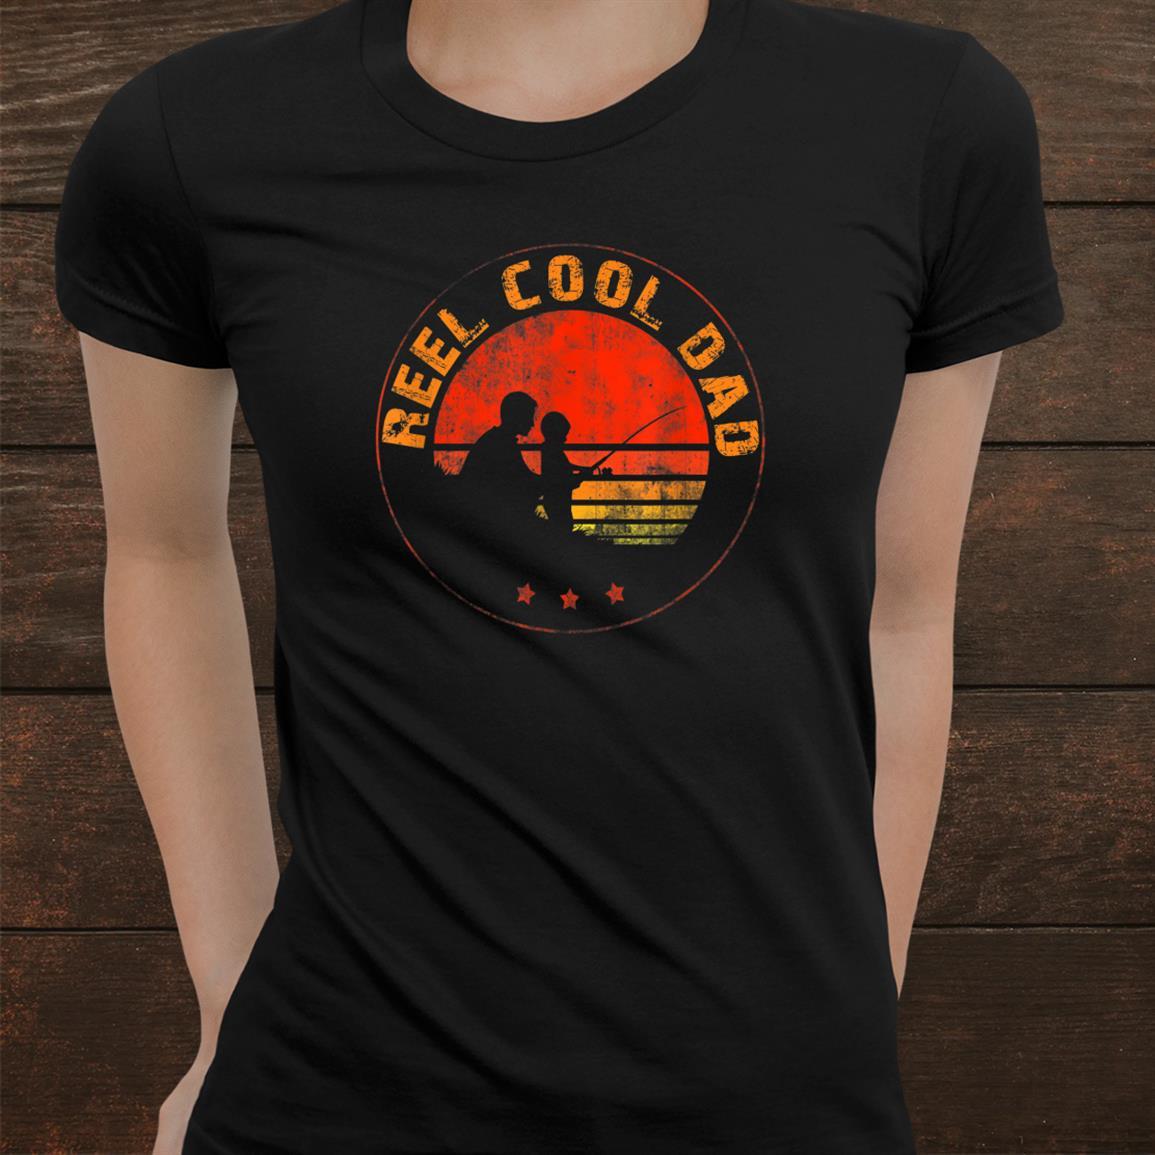 Retro Reel Cool Dad Fishing Daddy Vintage Shirt